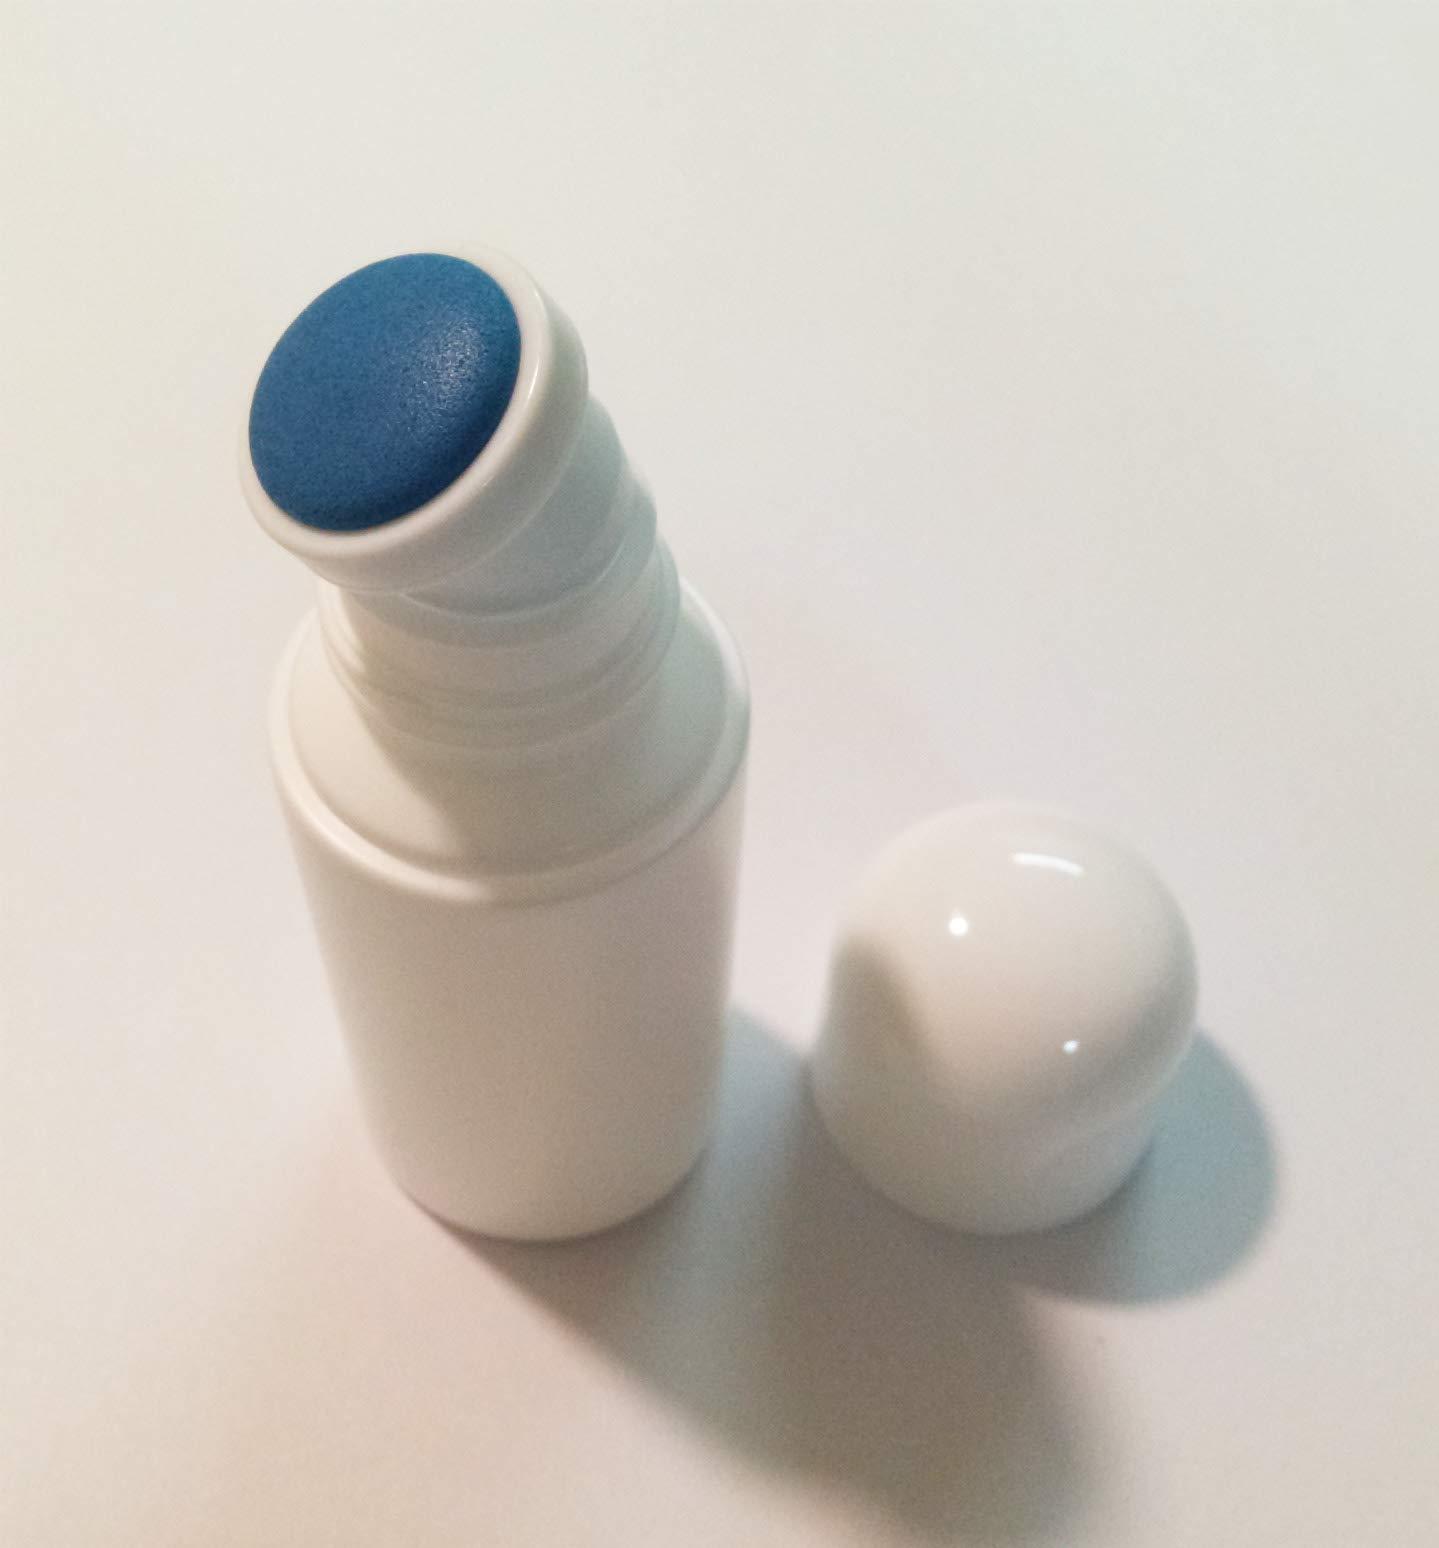 Plastic Bottle Empty Liquid Bottles Sponge Head Applicator Skin Care Scalp Hair Care Medicine Cosmetic Travel Use 50ml